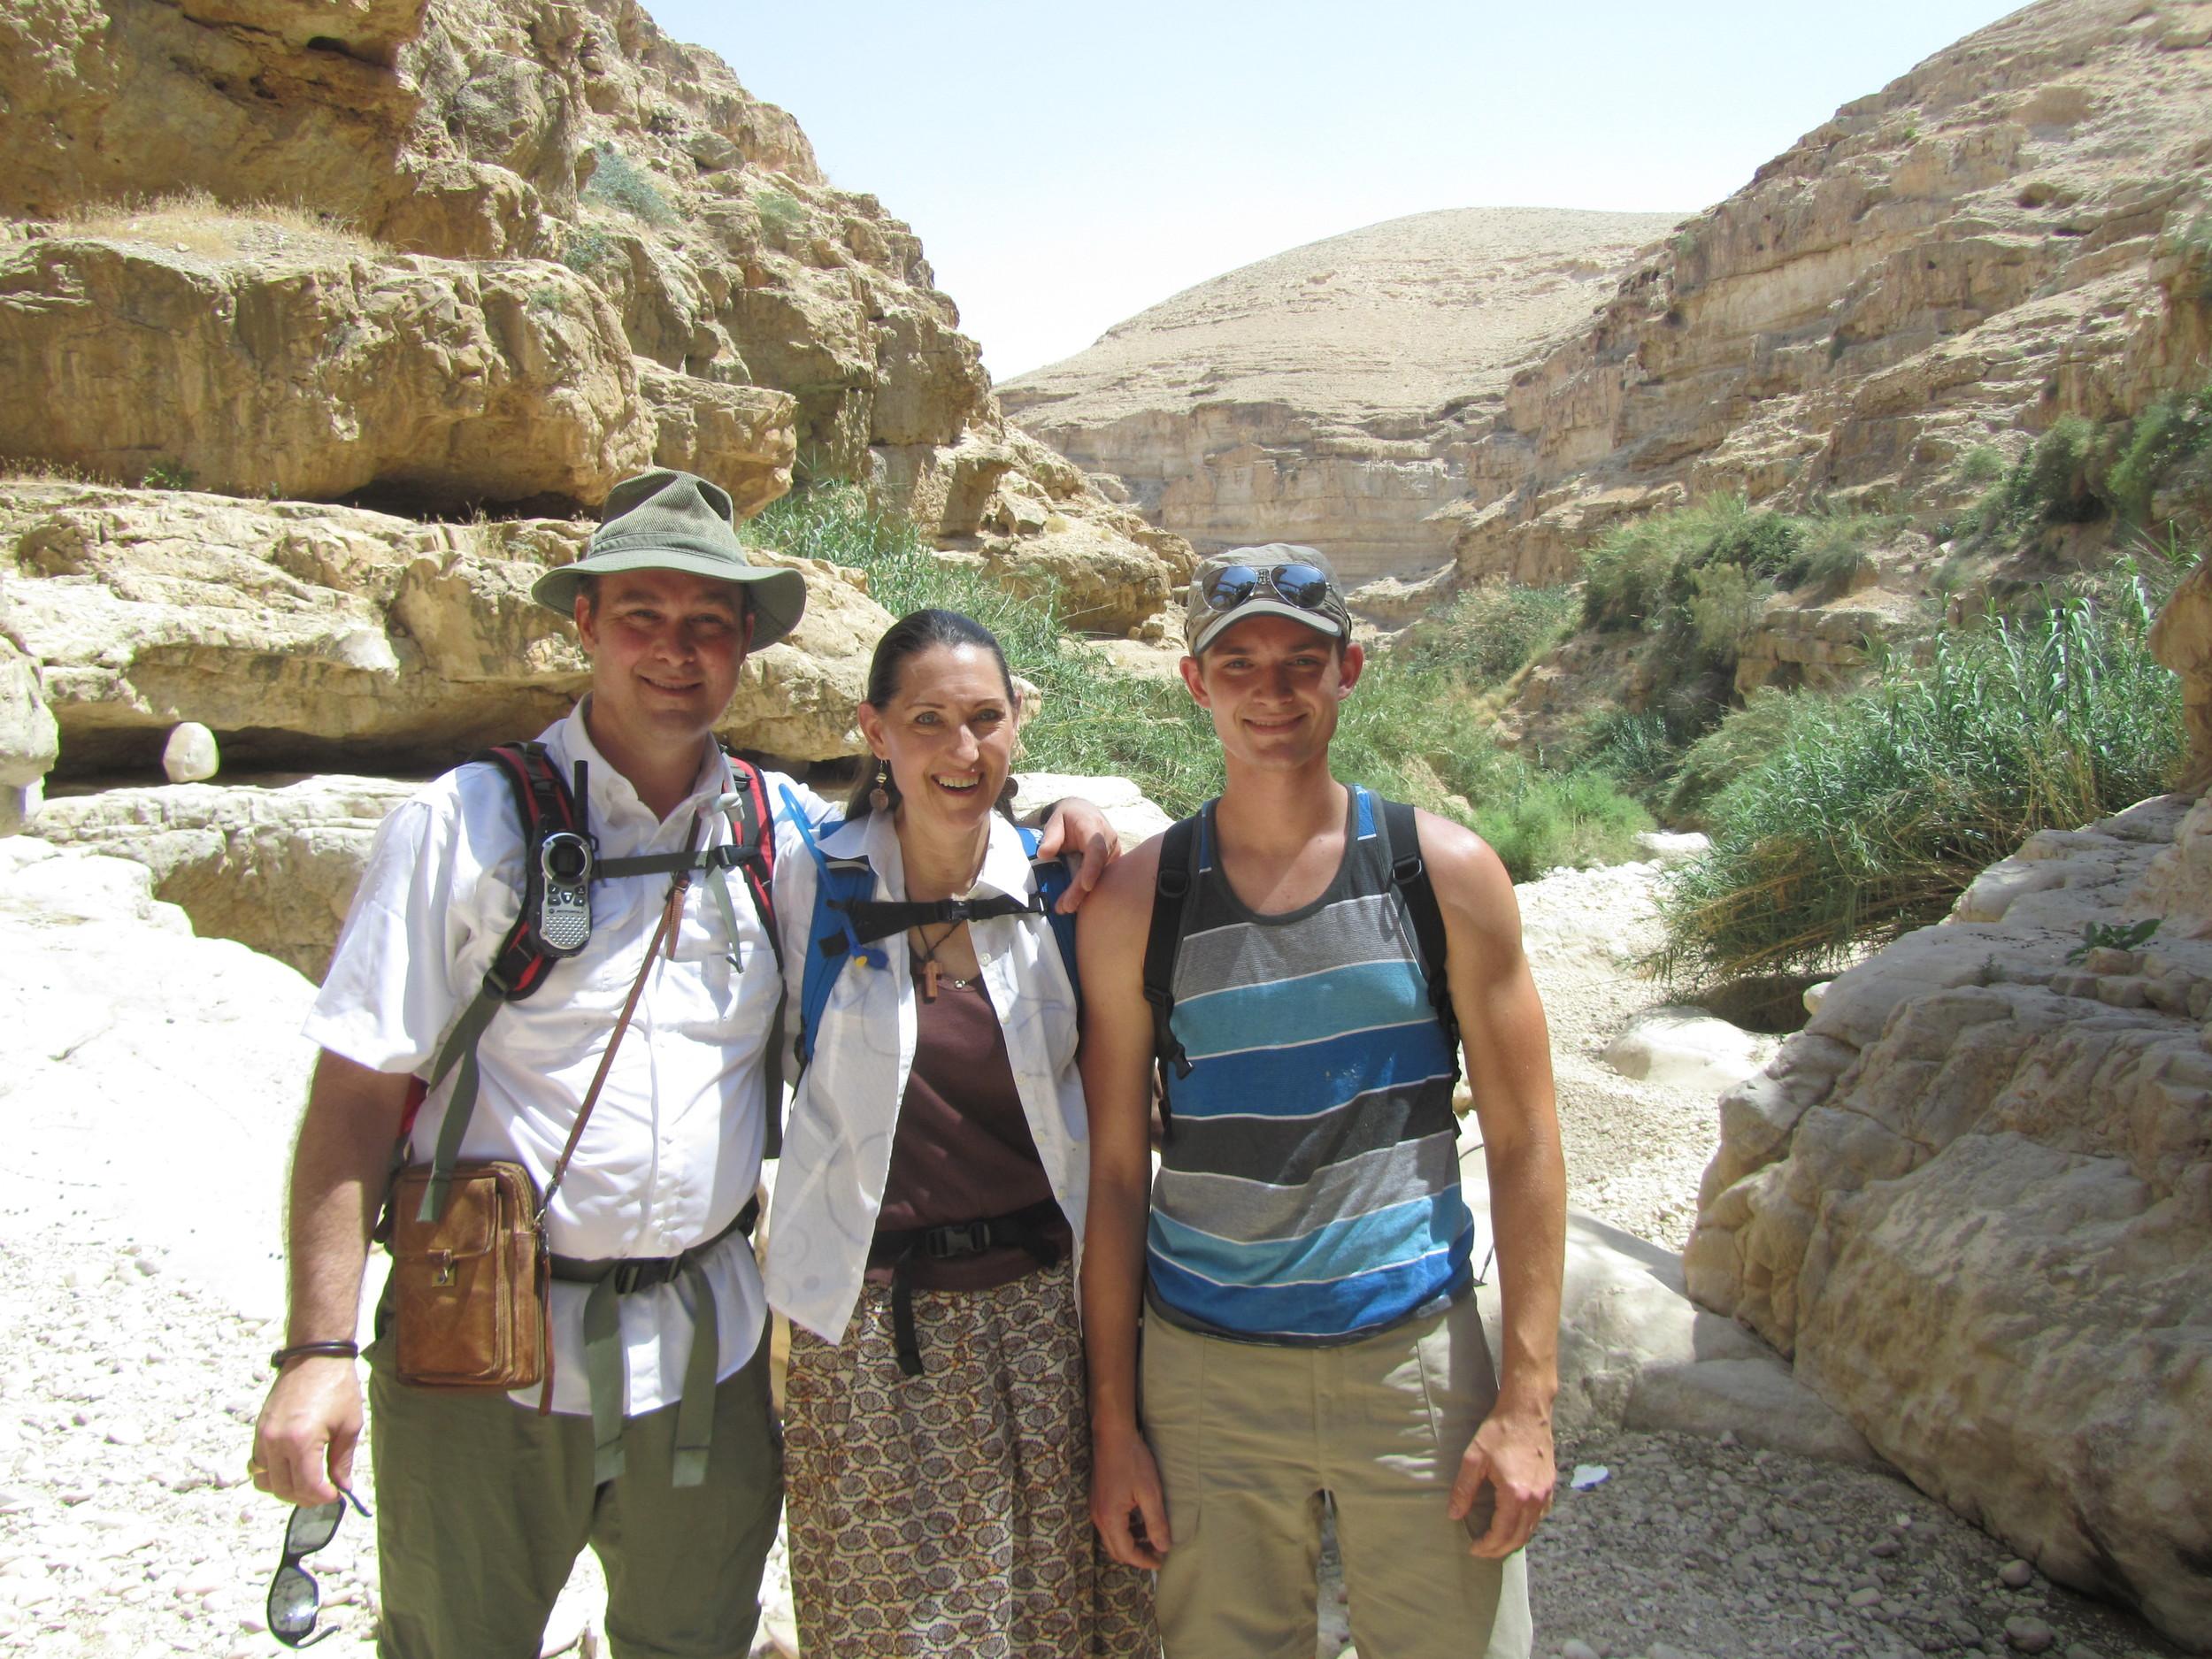 Bob, Pam, and Luke hiking in Wadi Kelt